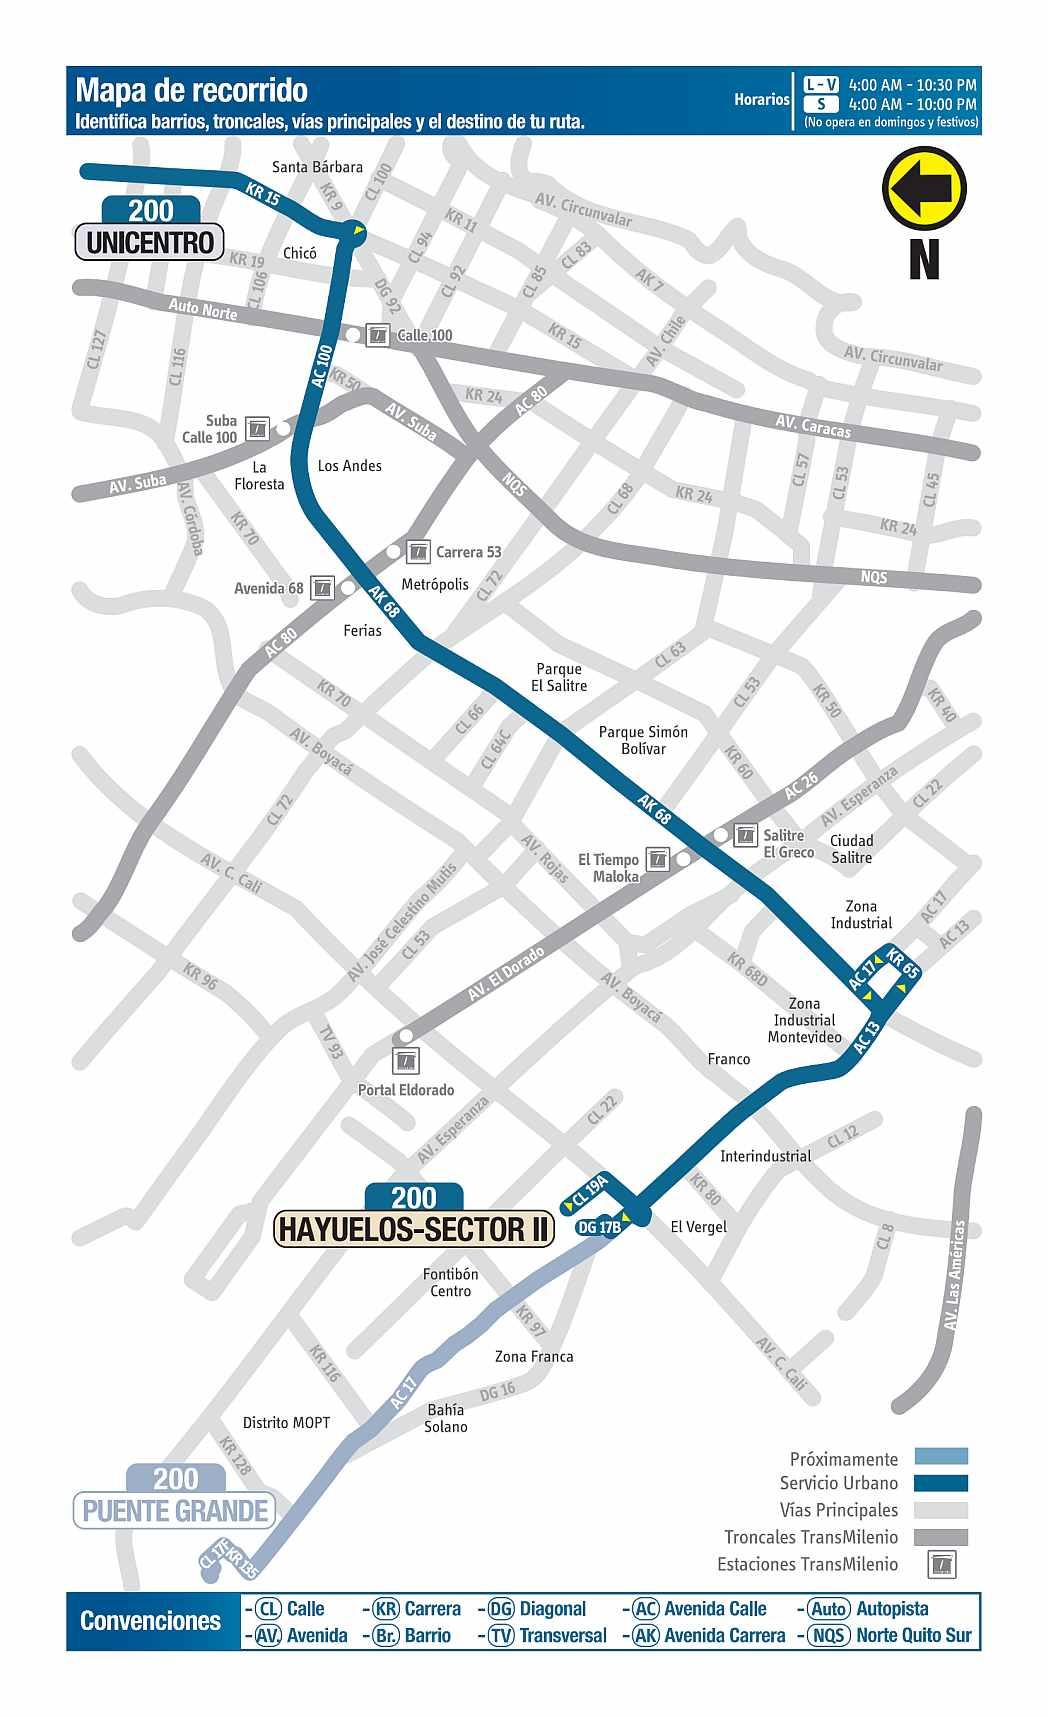 200 AV. Ciudad de Cali - Unicentro, mapa bus urbano Bogotá